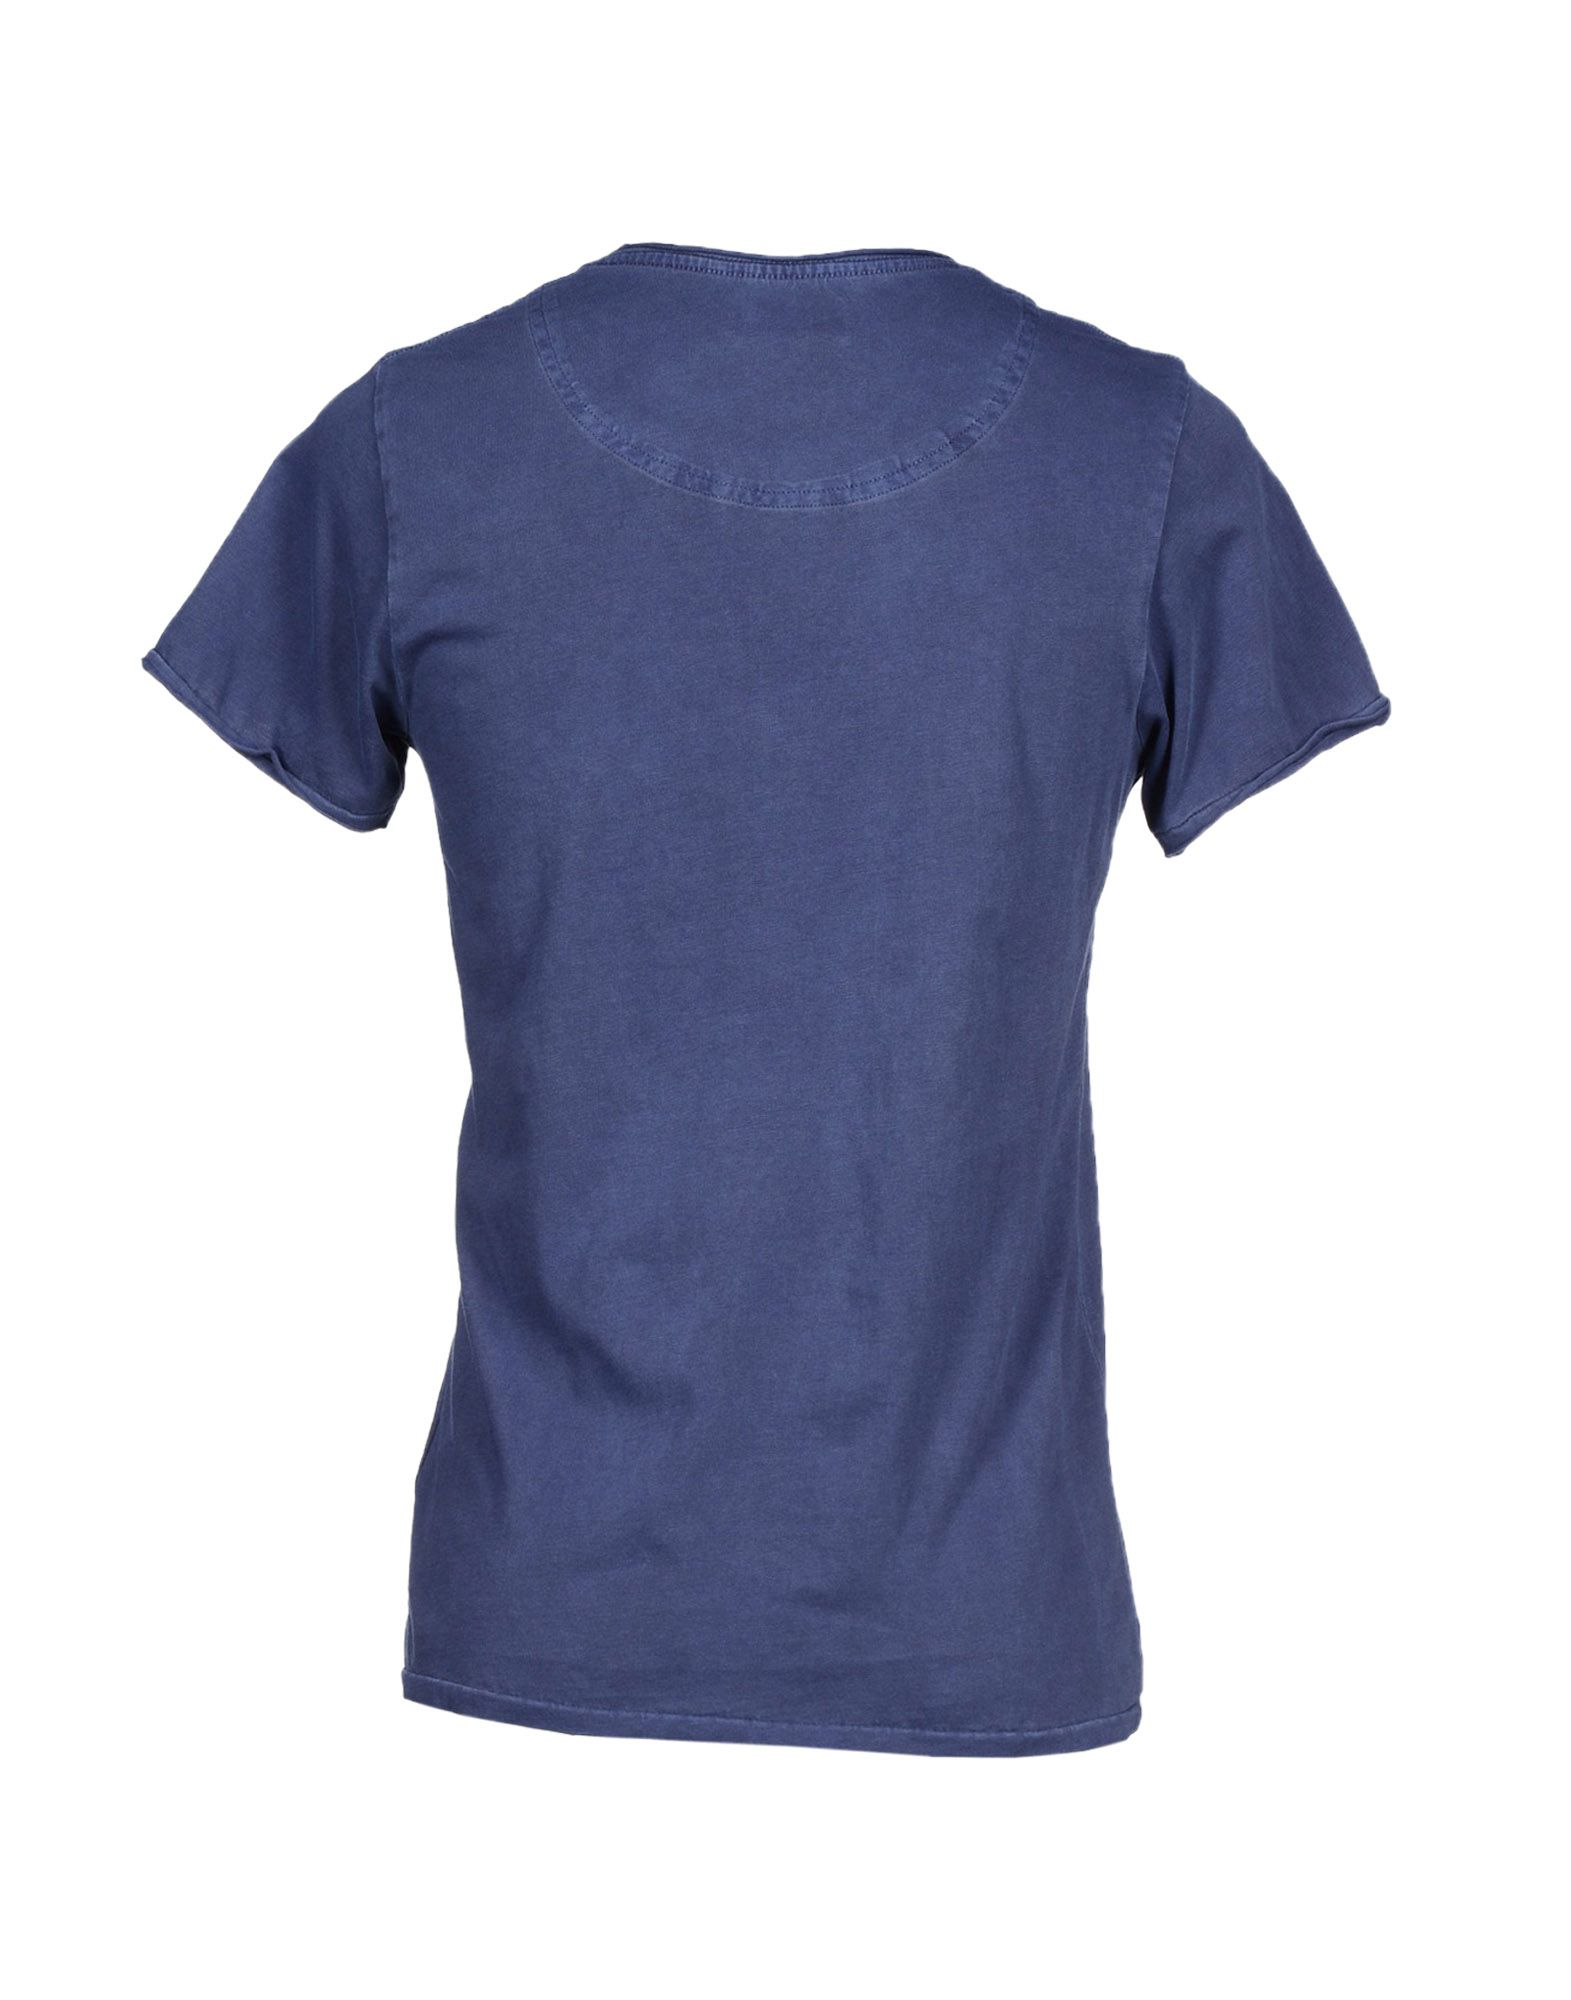 originals by jack jones gray t shirt short sleeve t shirts product 1. Black Bedroom Furniture Sets. Home Design Ideas